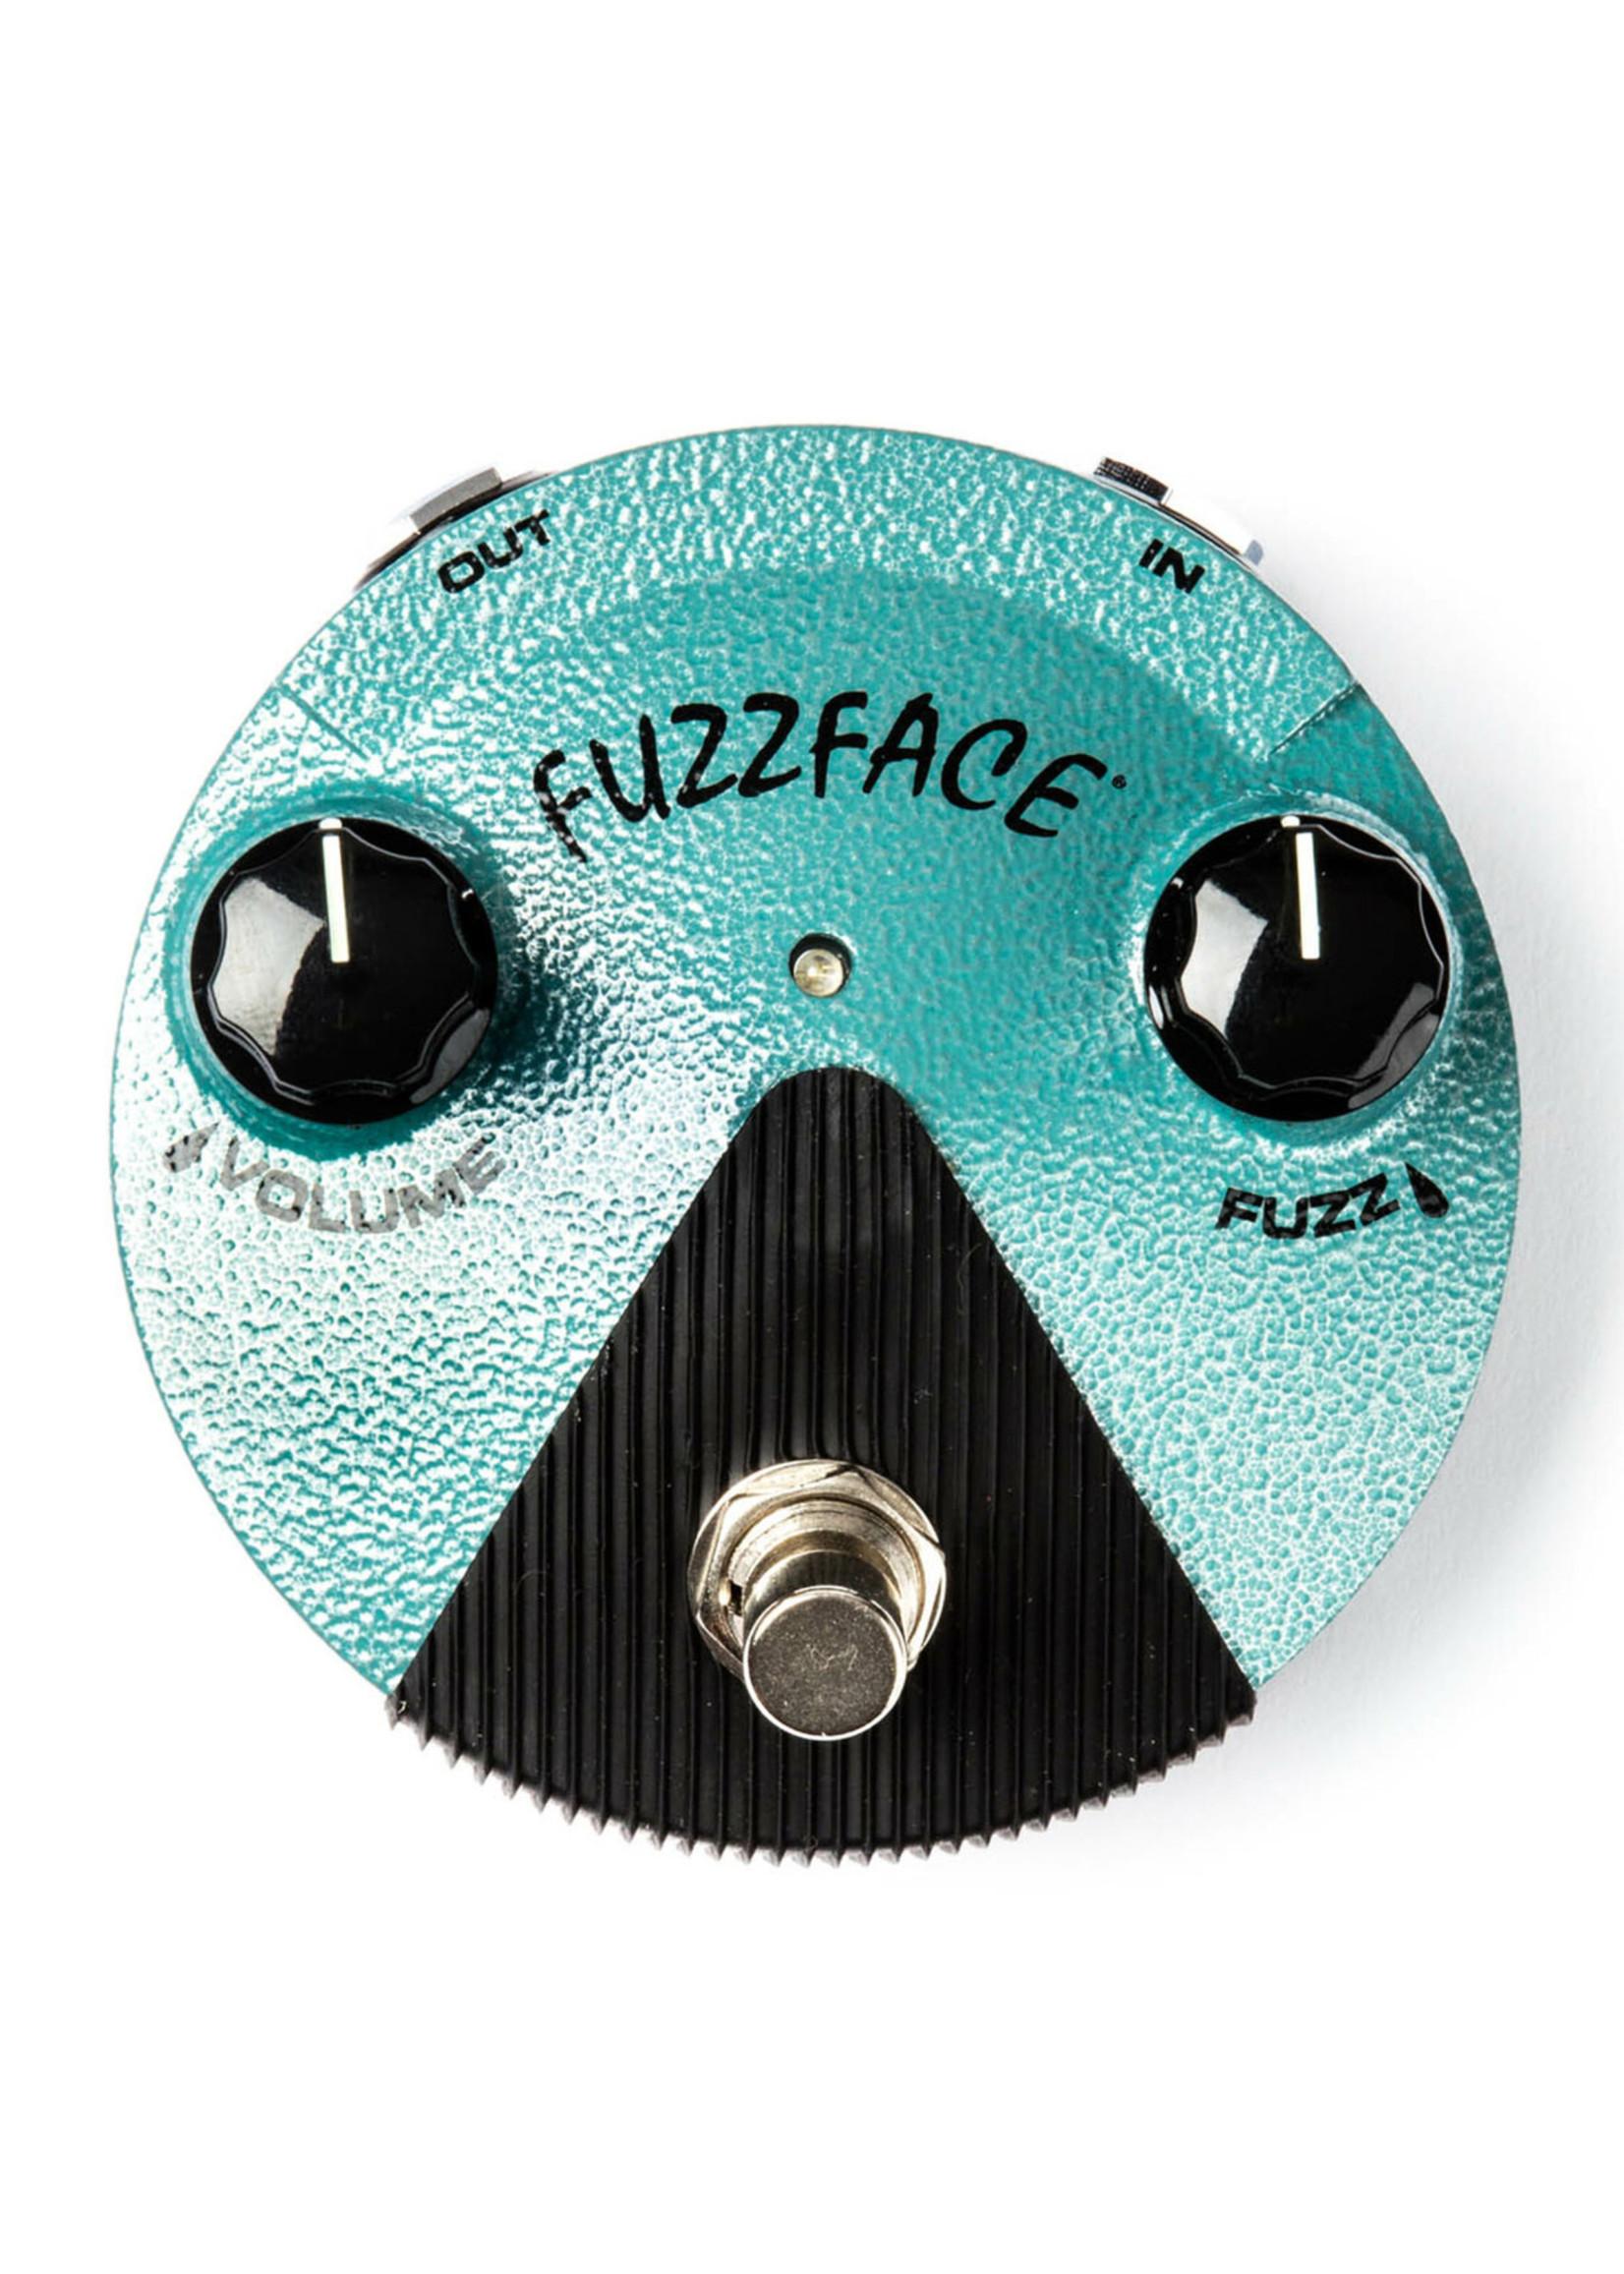 Dunlop Dunlop FFM3 Jimi Hendrix Fuzz Face